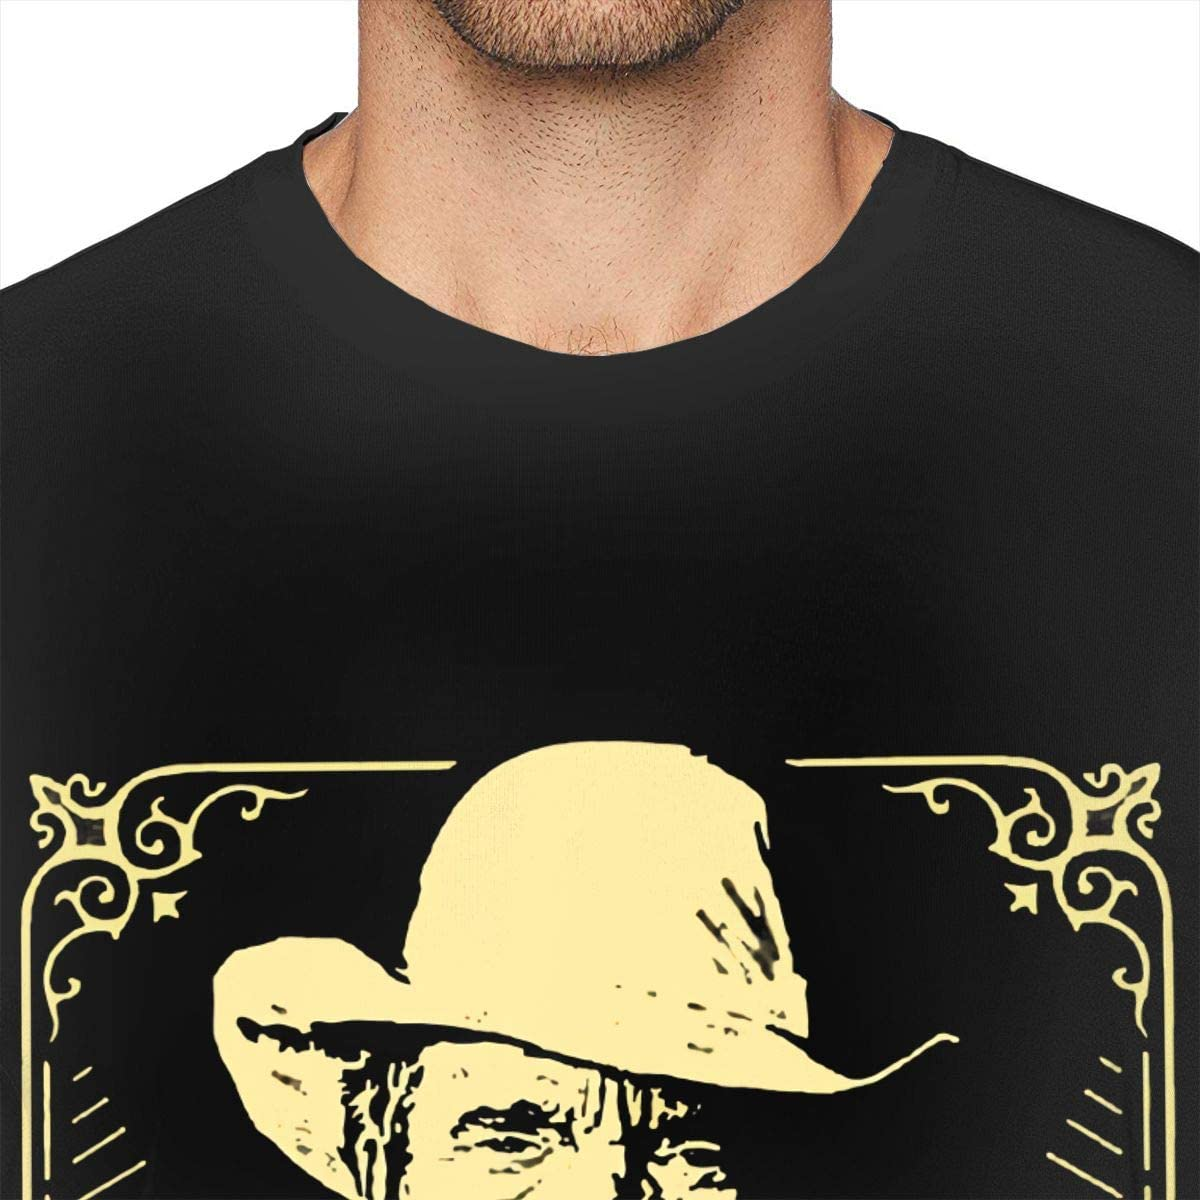 GekhHaon Cowboy Bebop Mans Pop Short Sleeves T Shirt Tees Black Cotton Short Sleeve Comfy TopsBlack